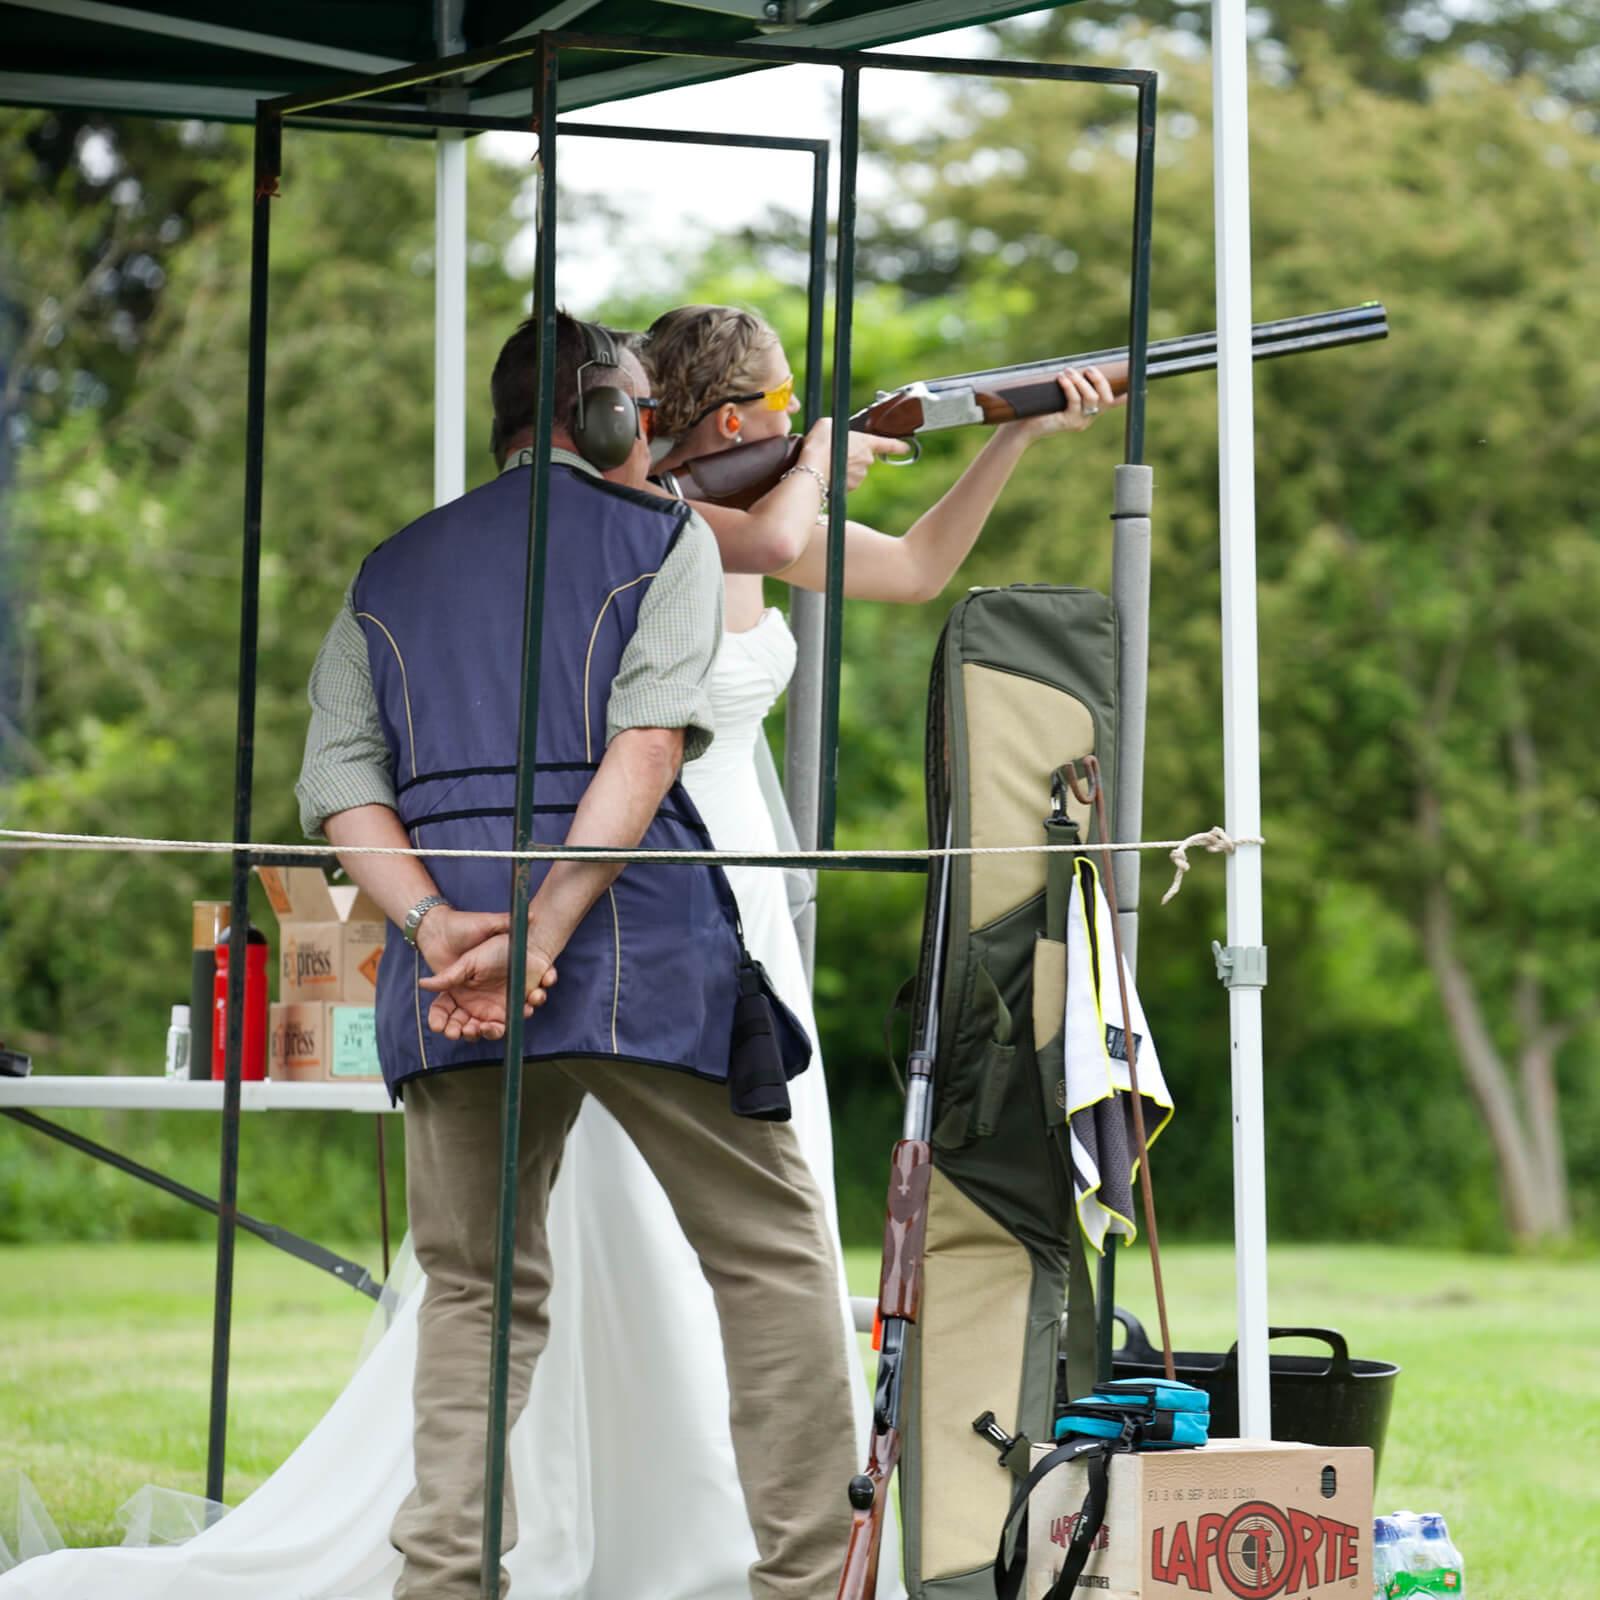 Warwickshire-wedding-photographer-Ettington-shoots